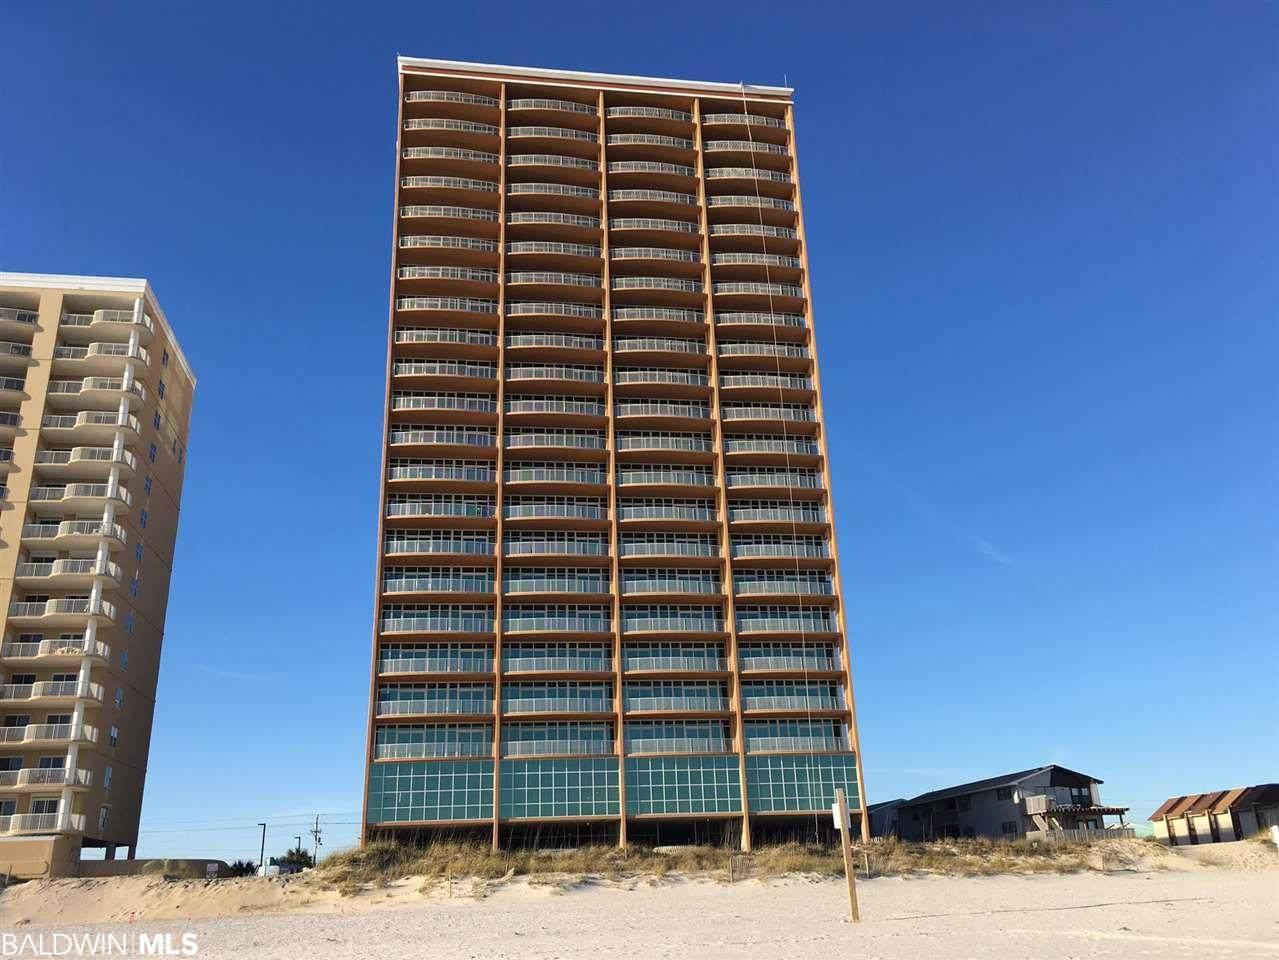 801 Beach Blvd - Photo 1